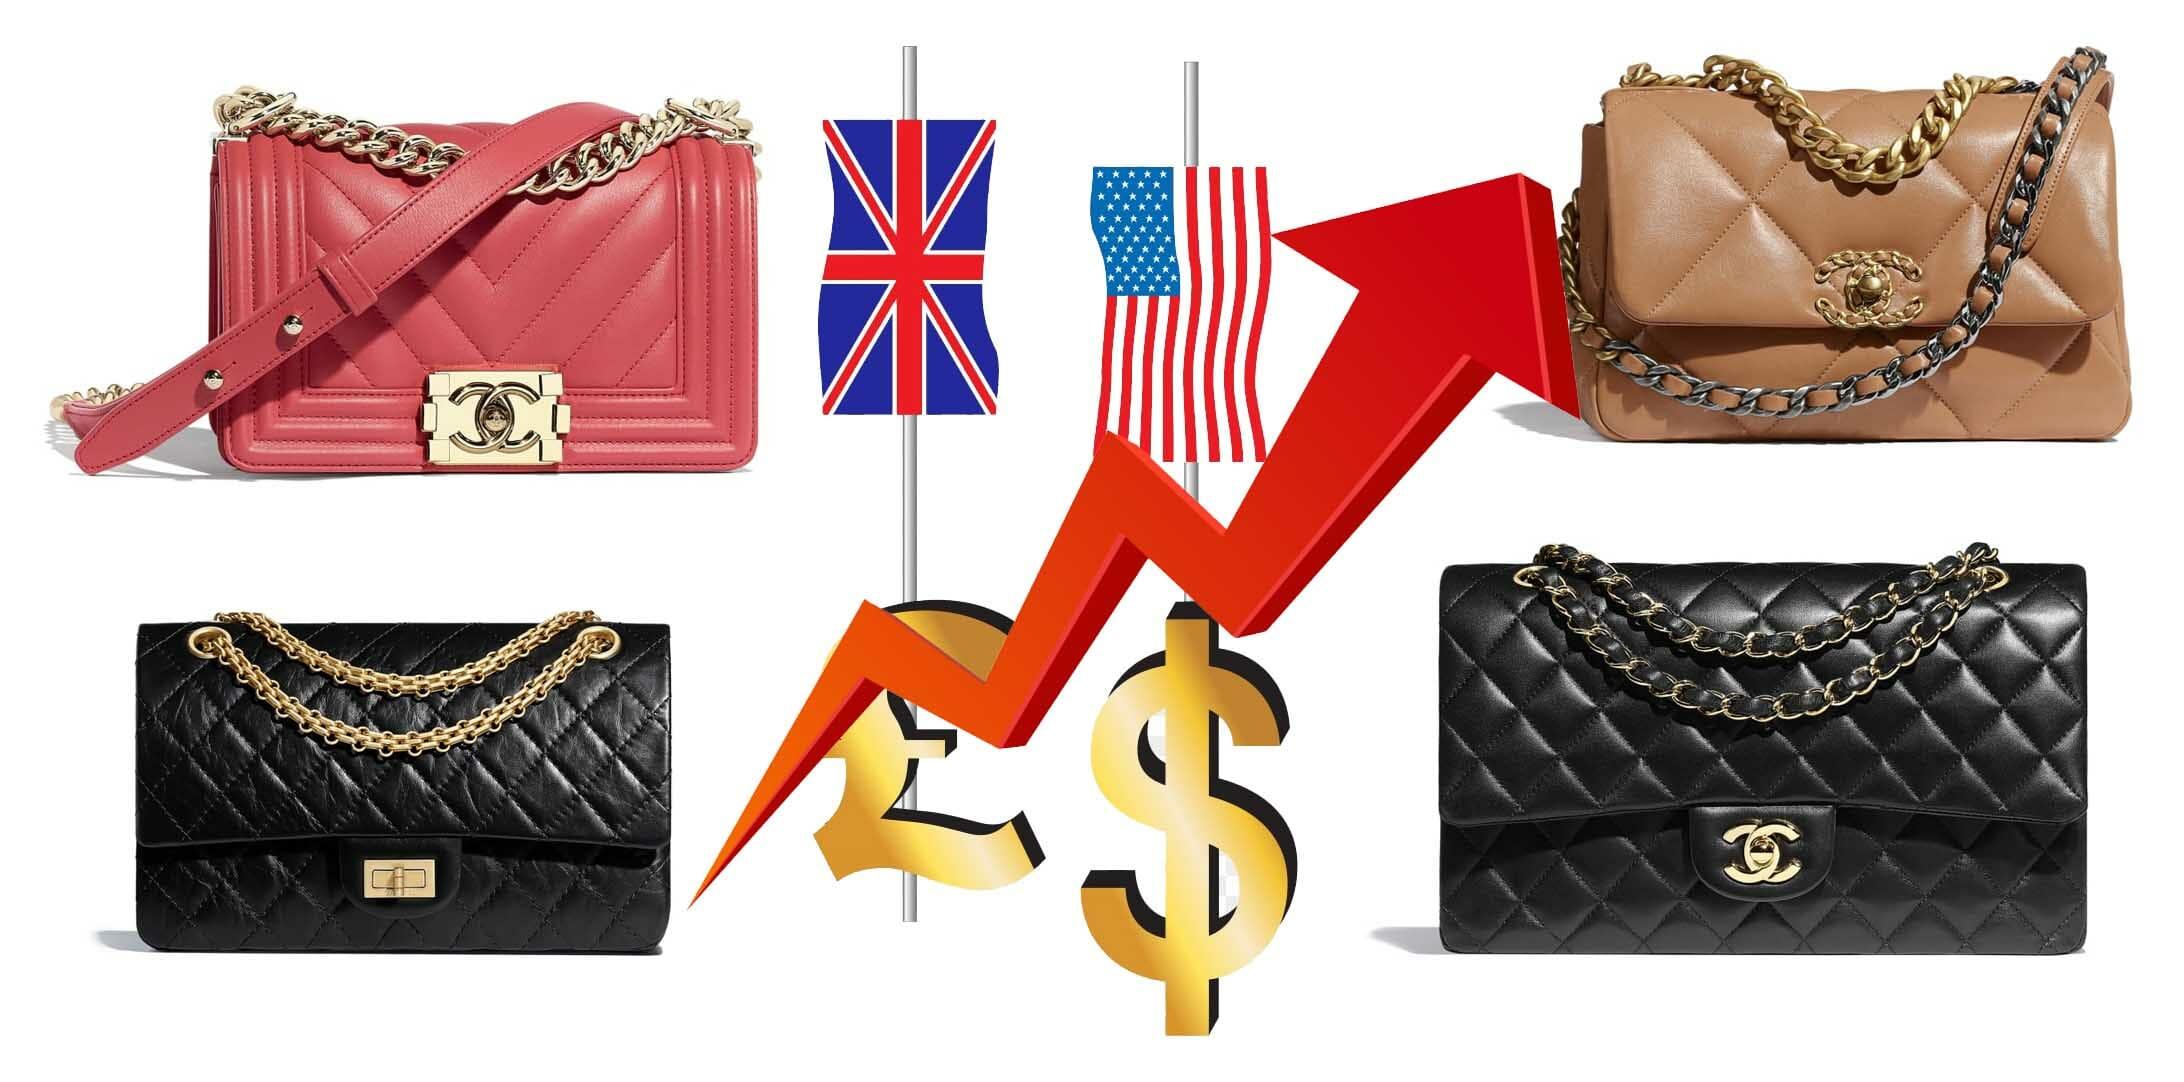 Chanel Bag Price Increase 2021 UK and US